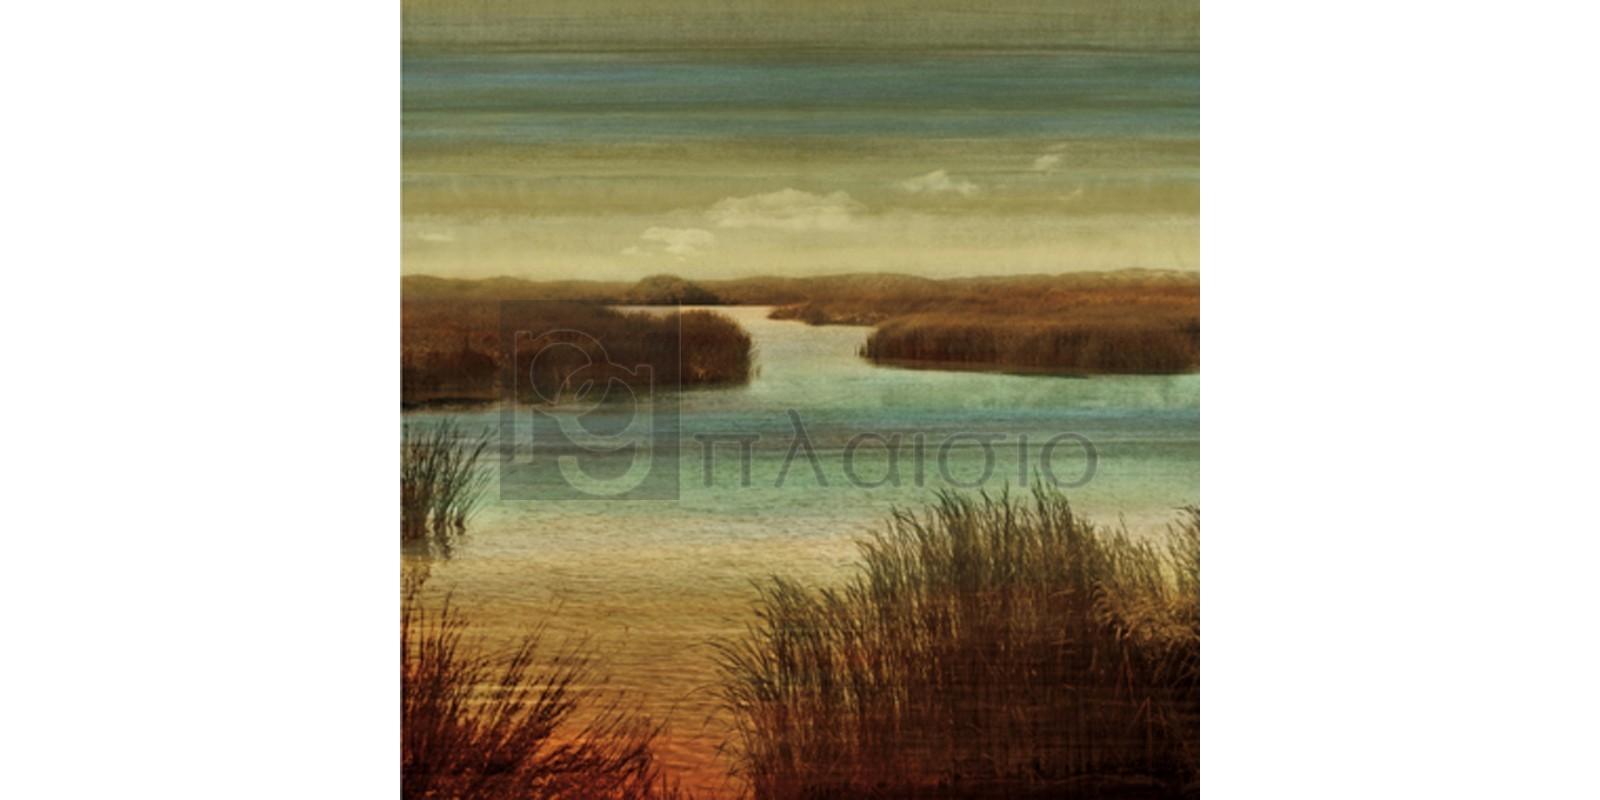 John Seba - On the Water I